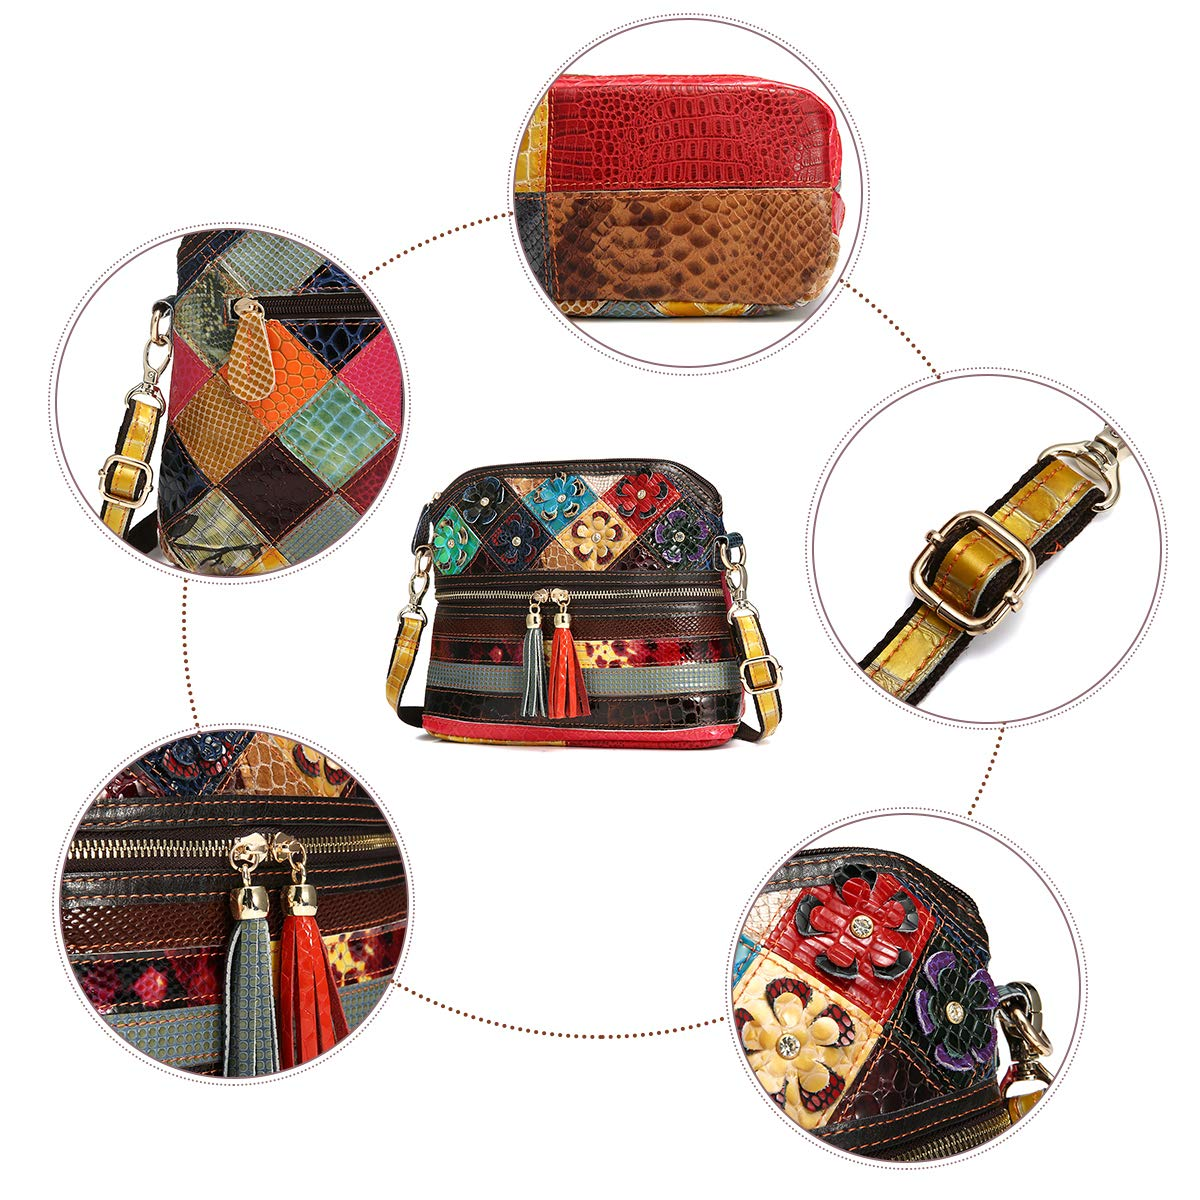 Bolso Crossbody de Moda OURBAG Bolso de Cuero de Mujer Vintage Bolso de Hombro Bolso de Playa para Mujer Vistoso